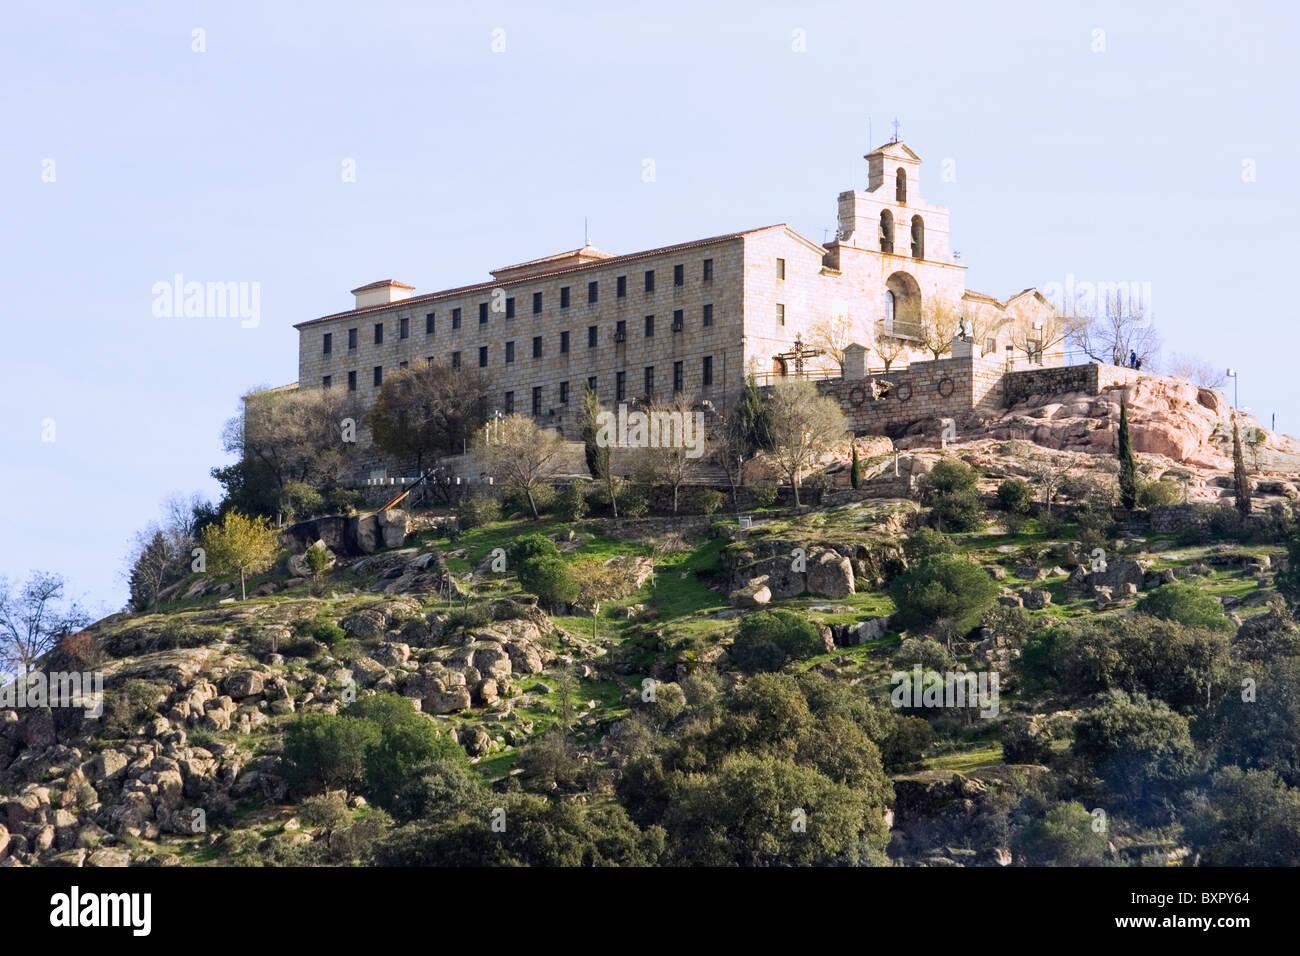 Sanctuary of the Virgen de la Cabeza, Sierra Morena, Andujar, Jaen Province, Spain. - Stock Image